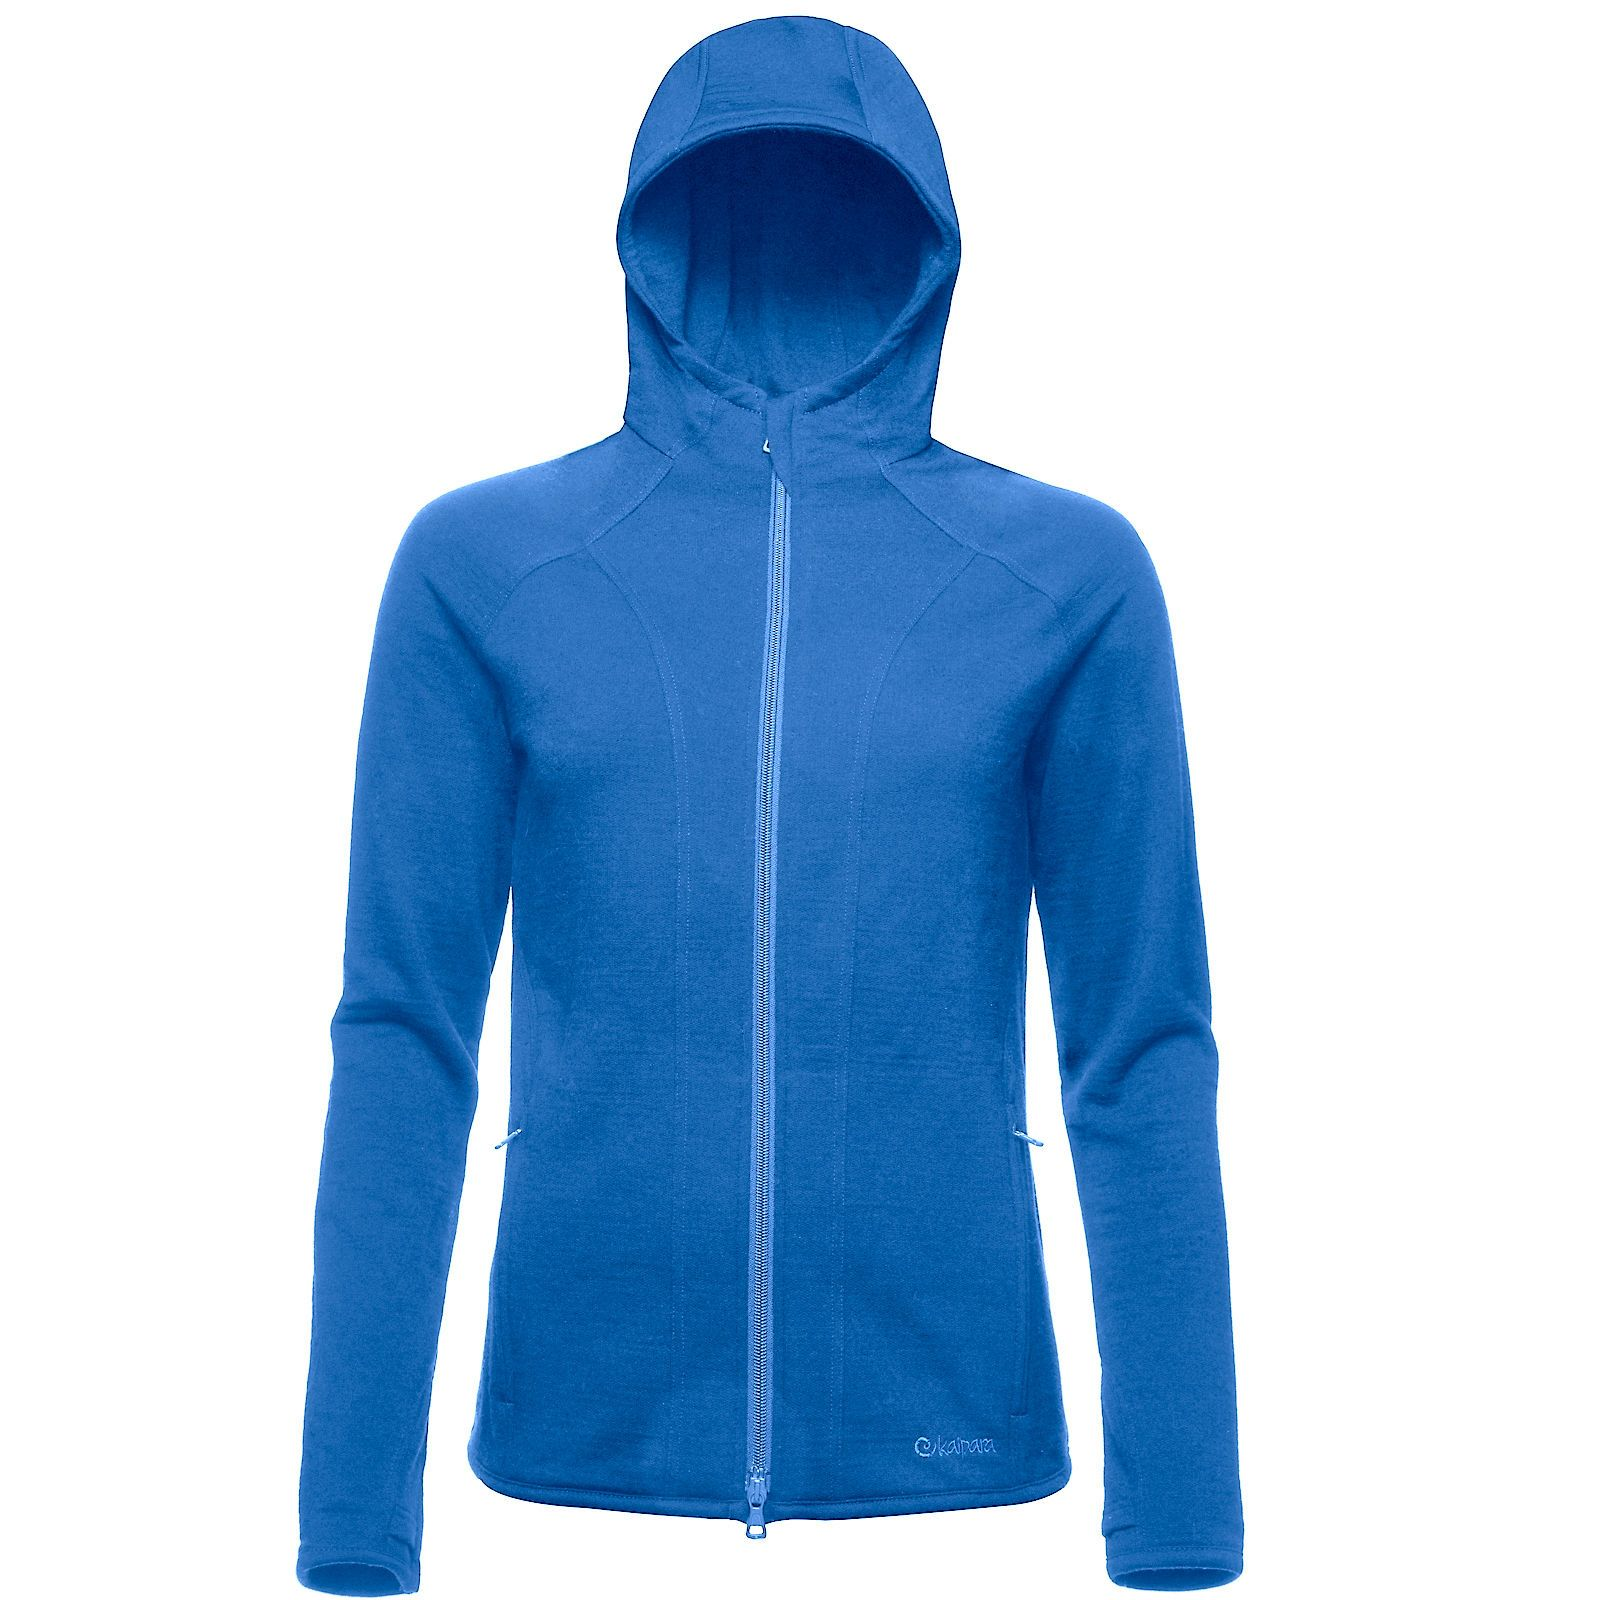 Merino Hoody Sweat Jacke Damen 270